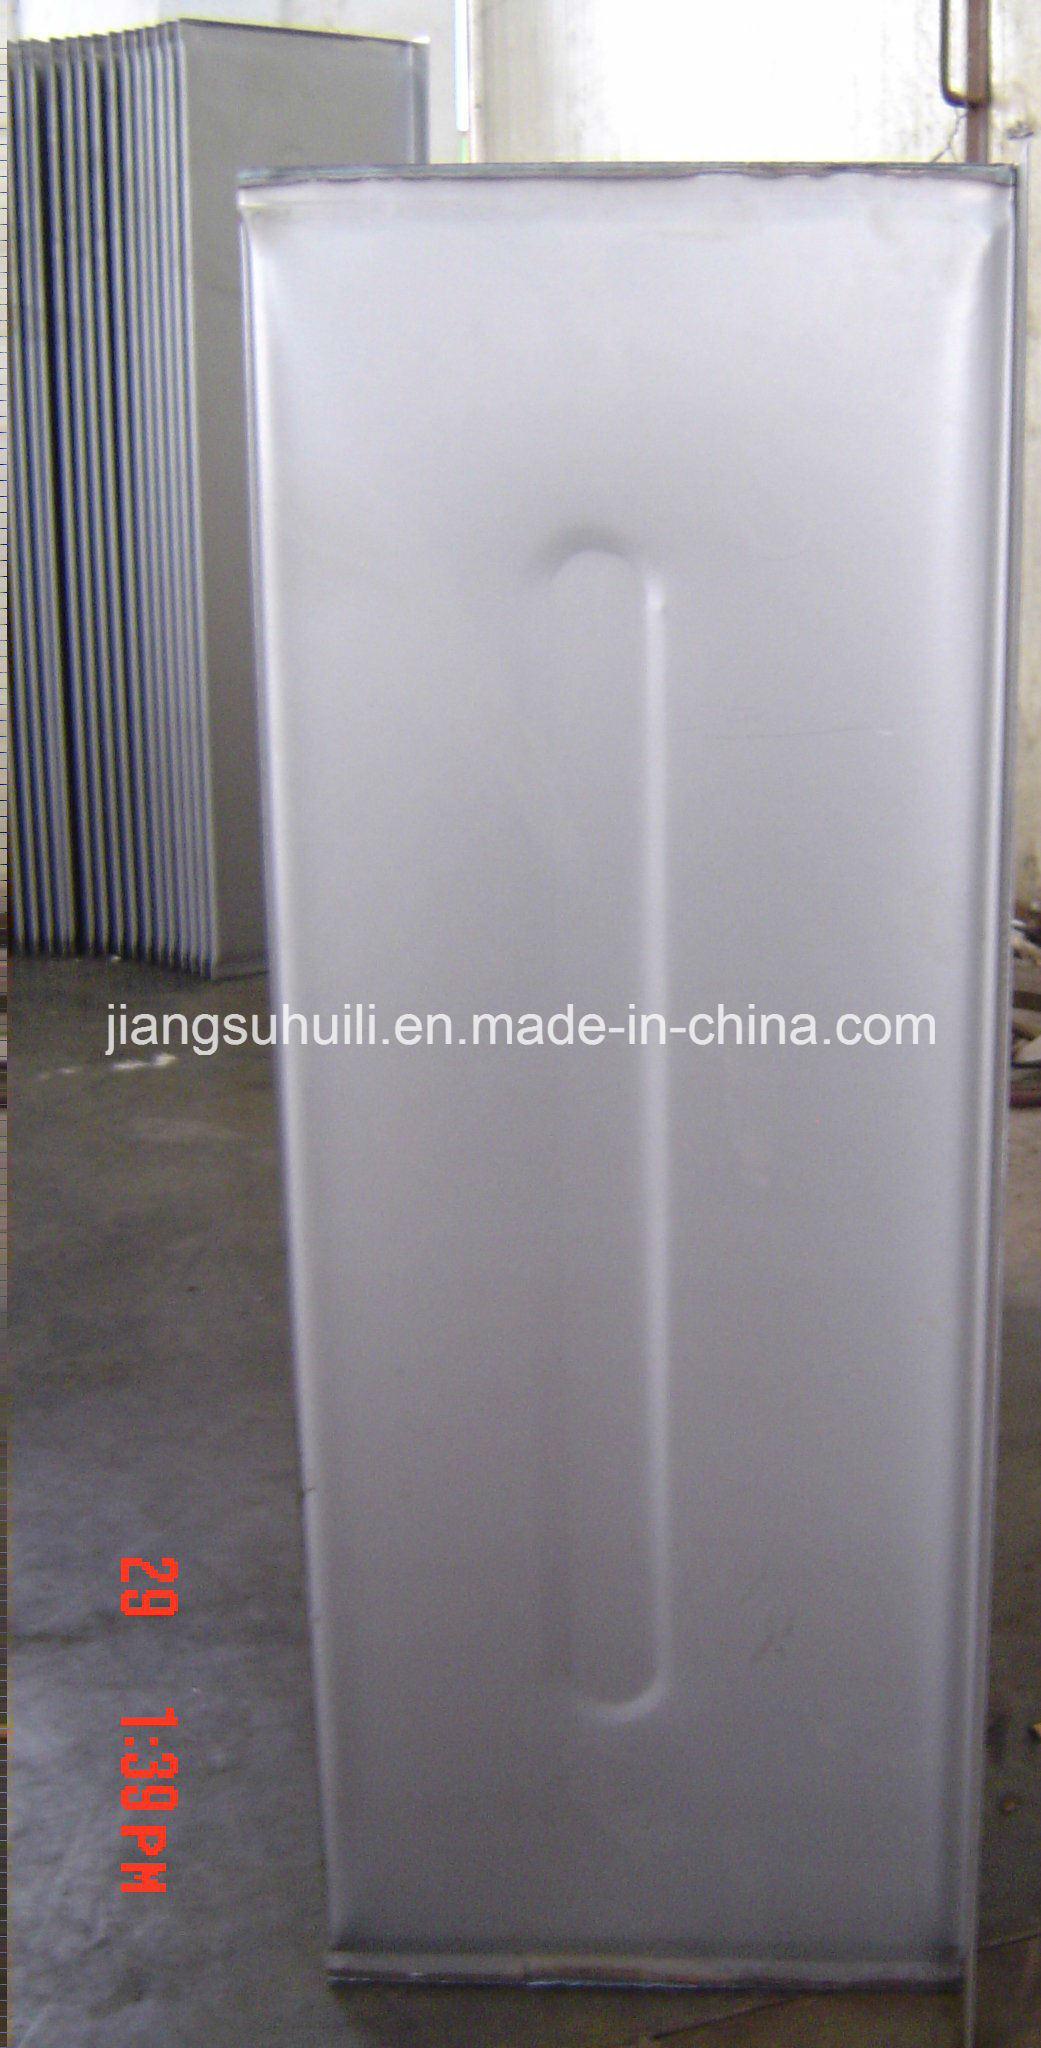 Transformer Tank Corrugated Fin Wall